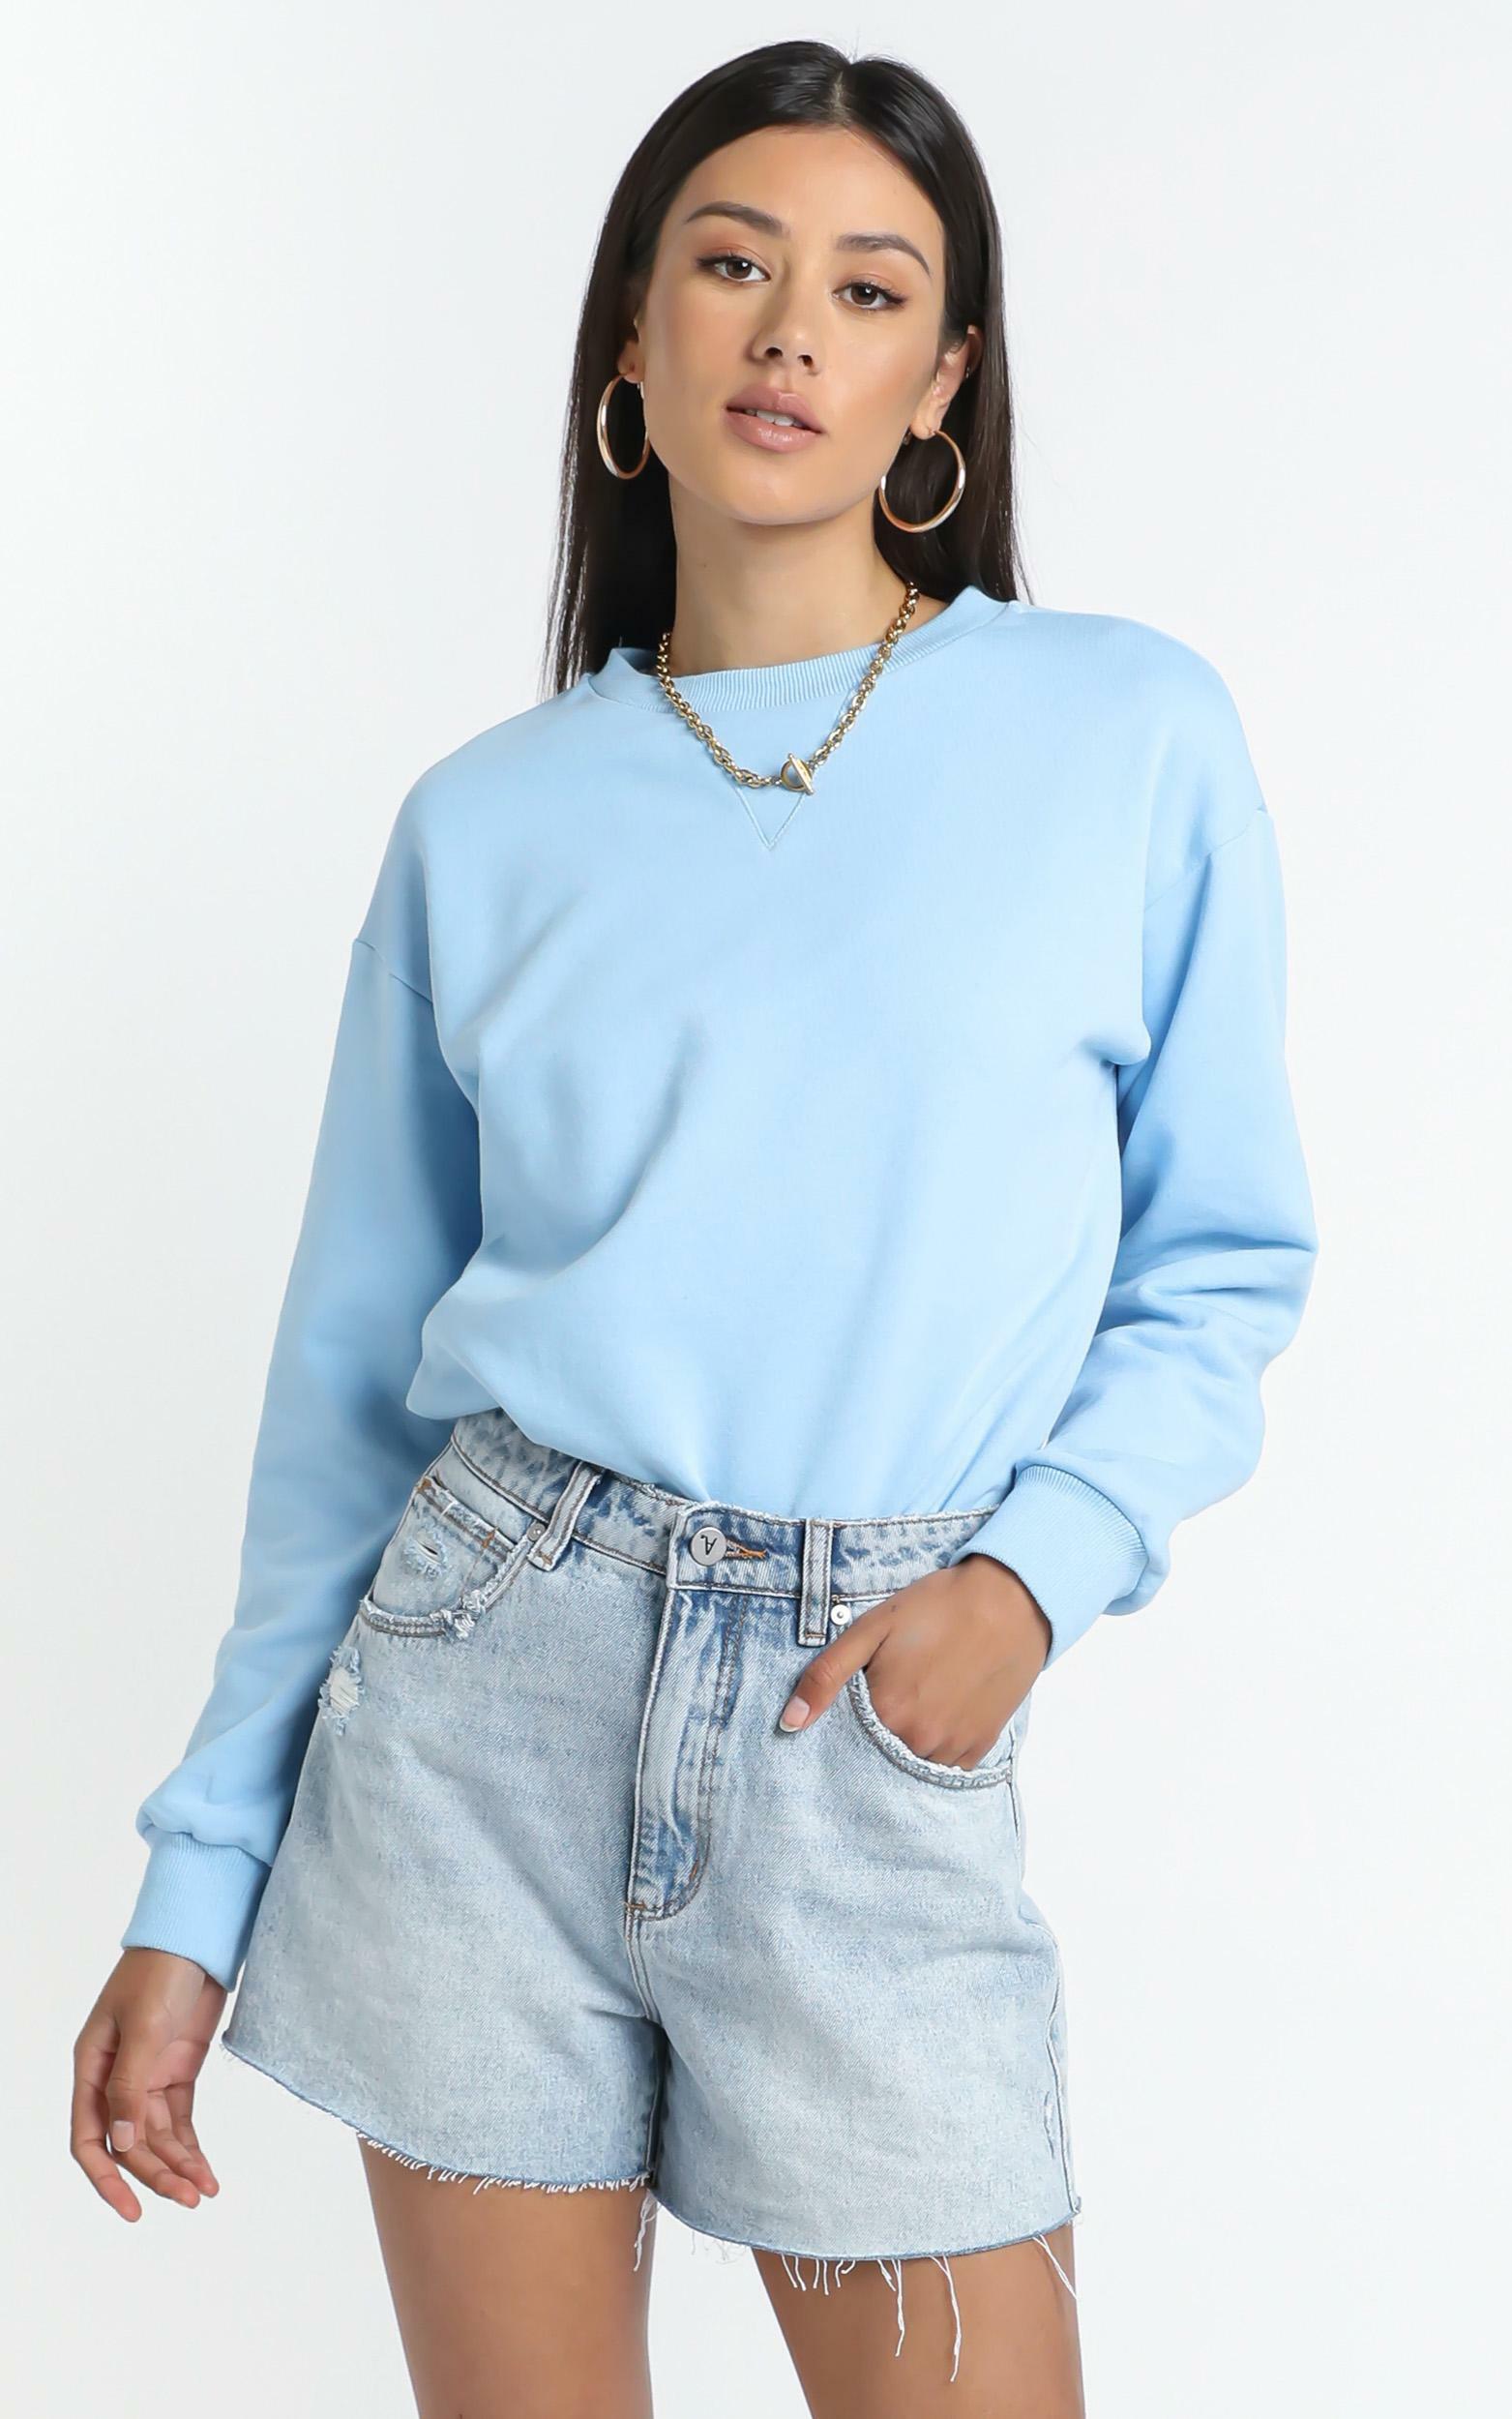 Lourdes Sweatshirt in Blue - 14 (XL), Blue, hi-res image number null